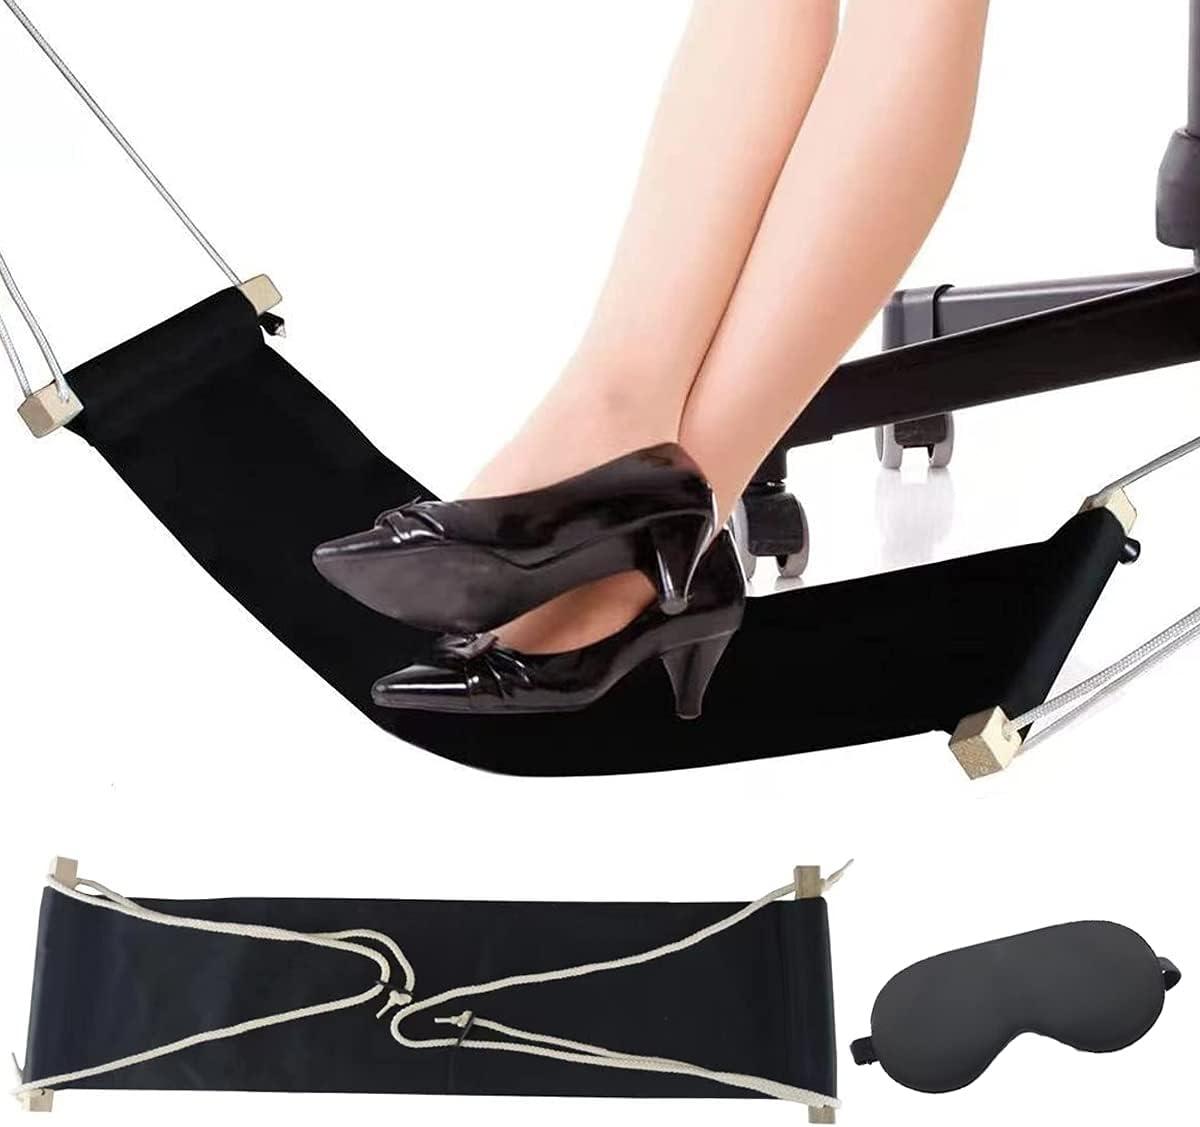 Foot Hammock Under Desk Rest Directly managed store OFFicial site Mat Mask Adjustable with Eye Black